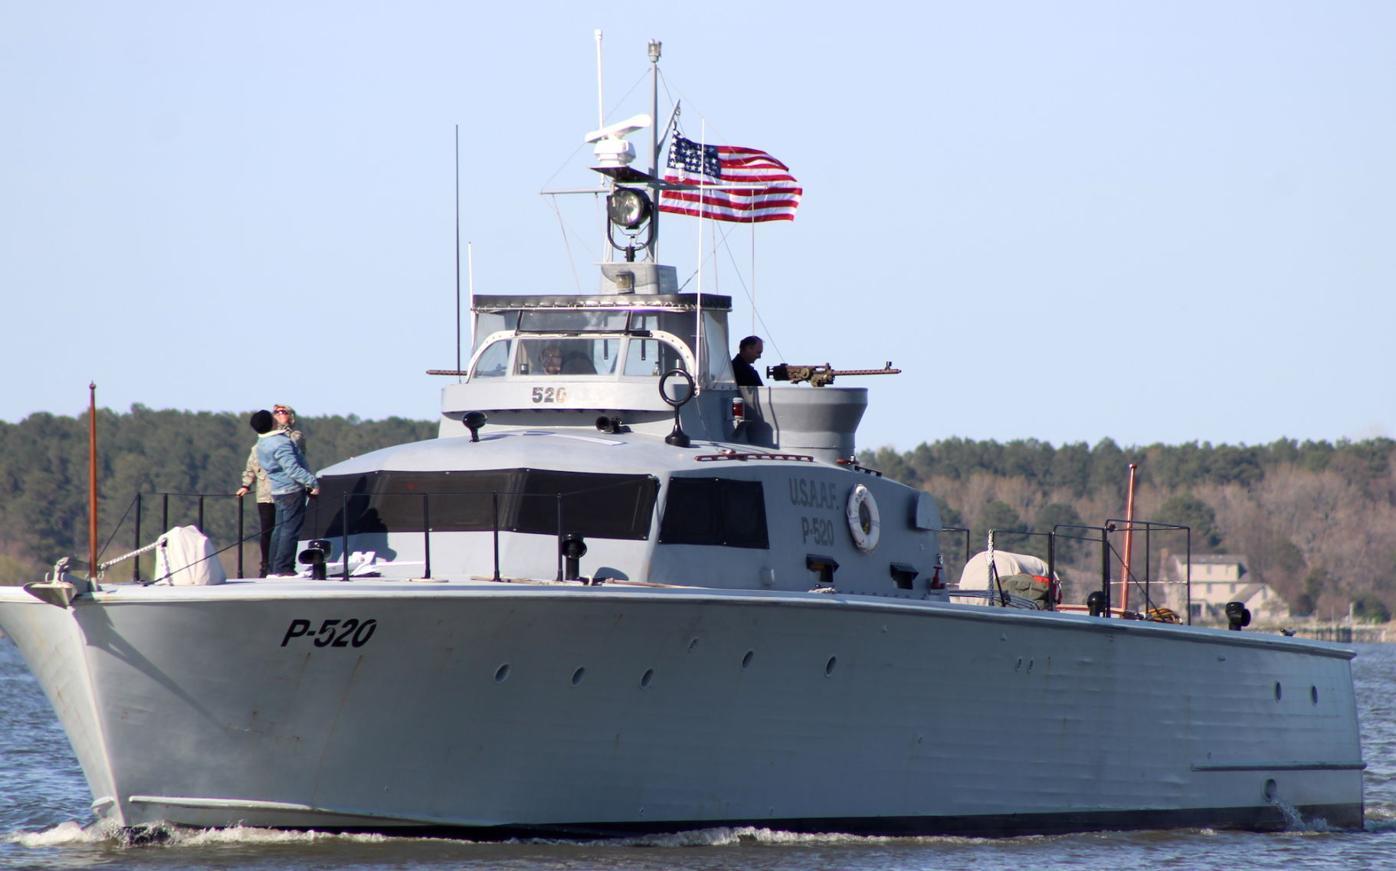 Crash boat P520 under sail